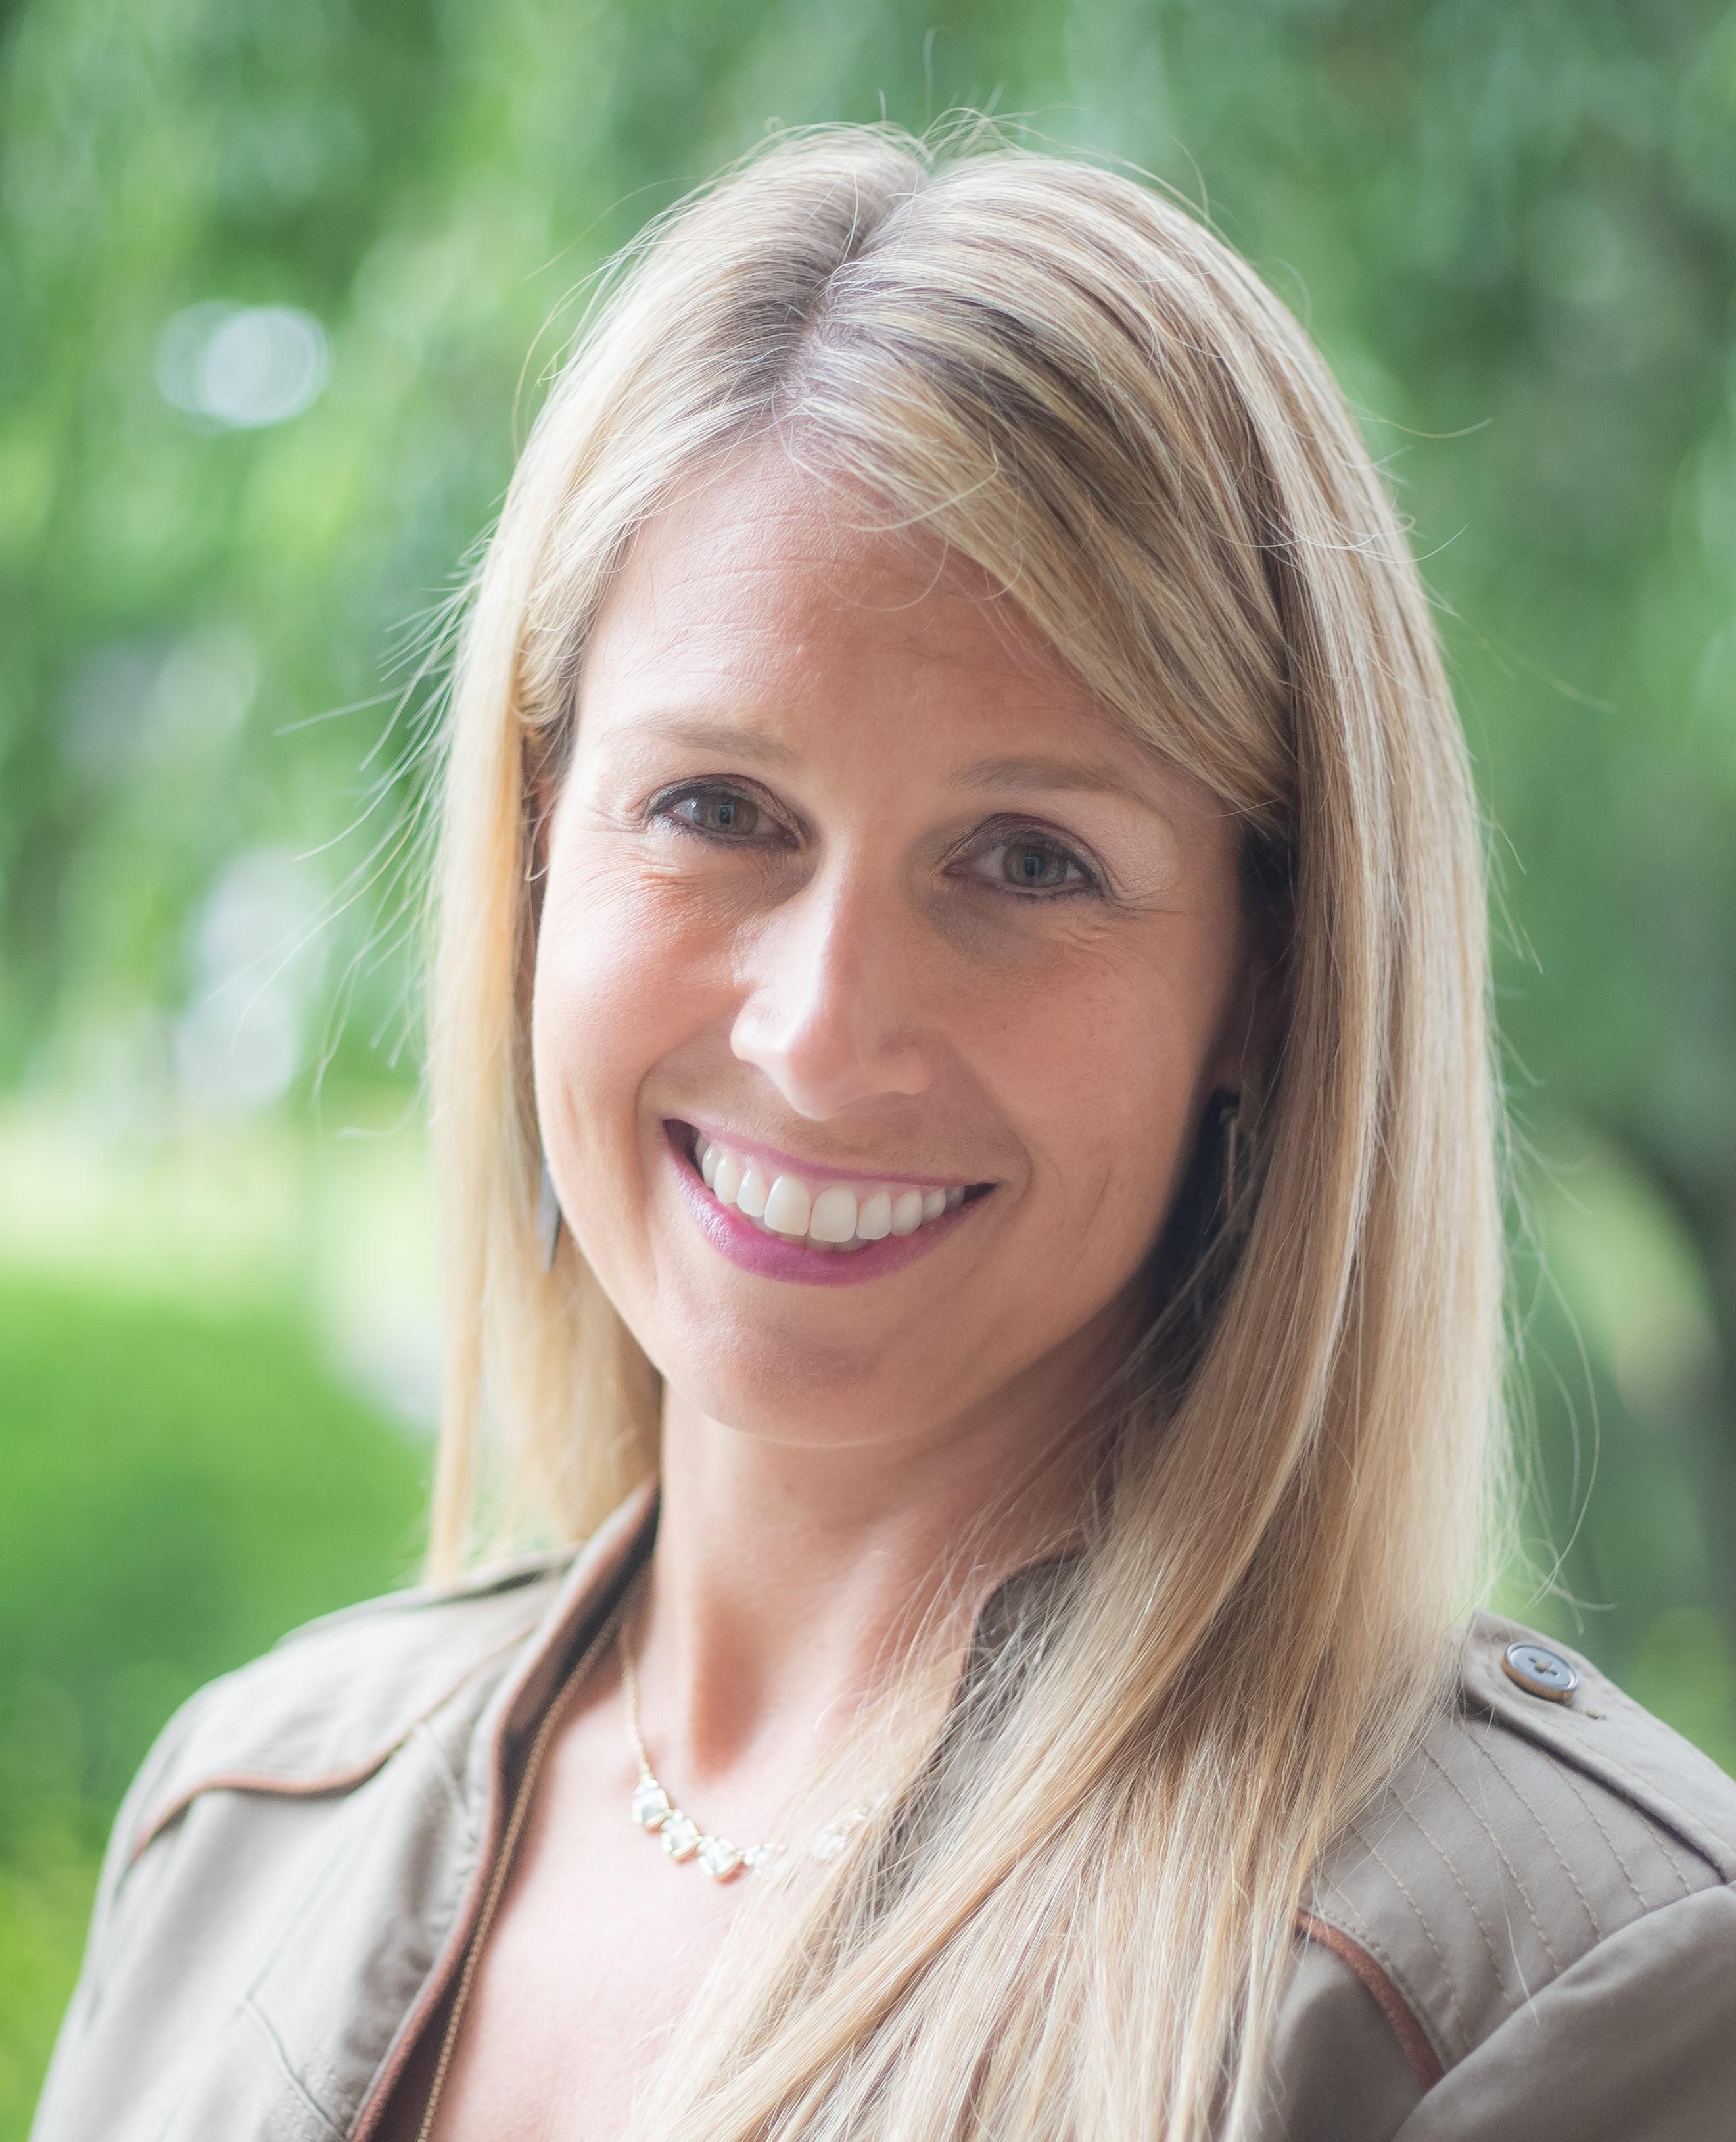 Maria Poindexter Vernon